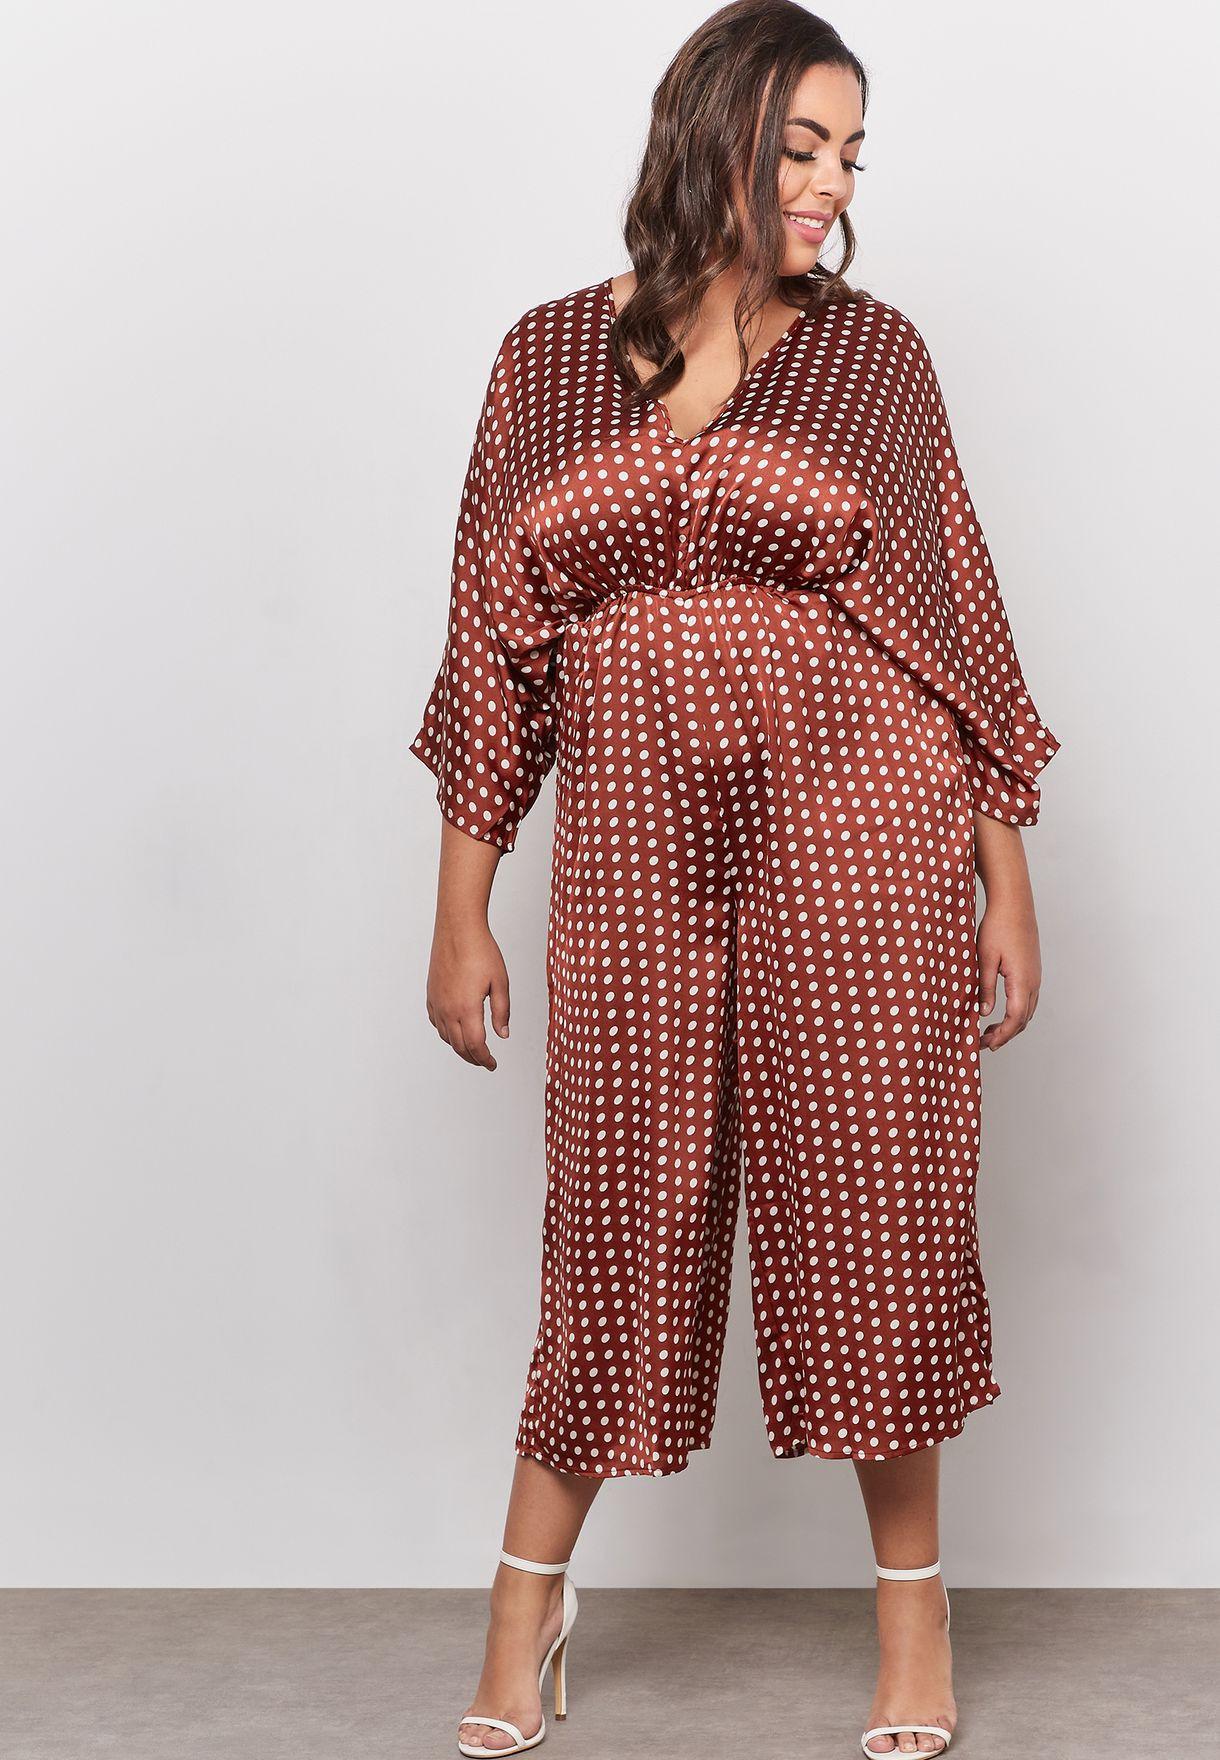 e6f0b7640ed Shop Missguided Curve prints Kimono Sleeve Polka Dot Culotte ...